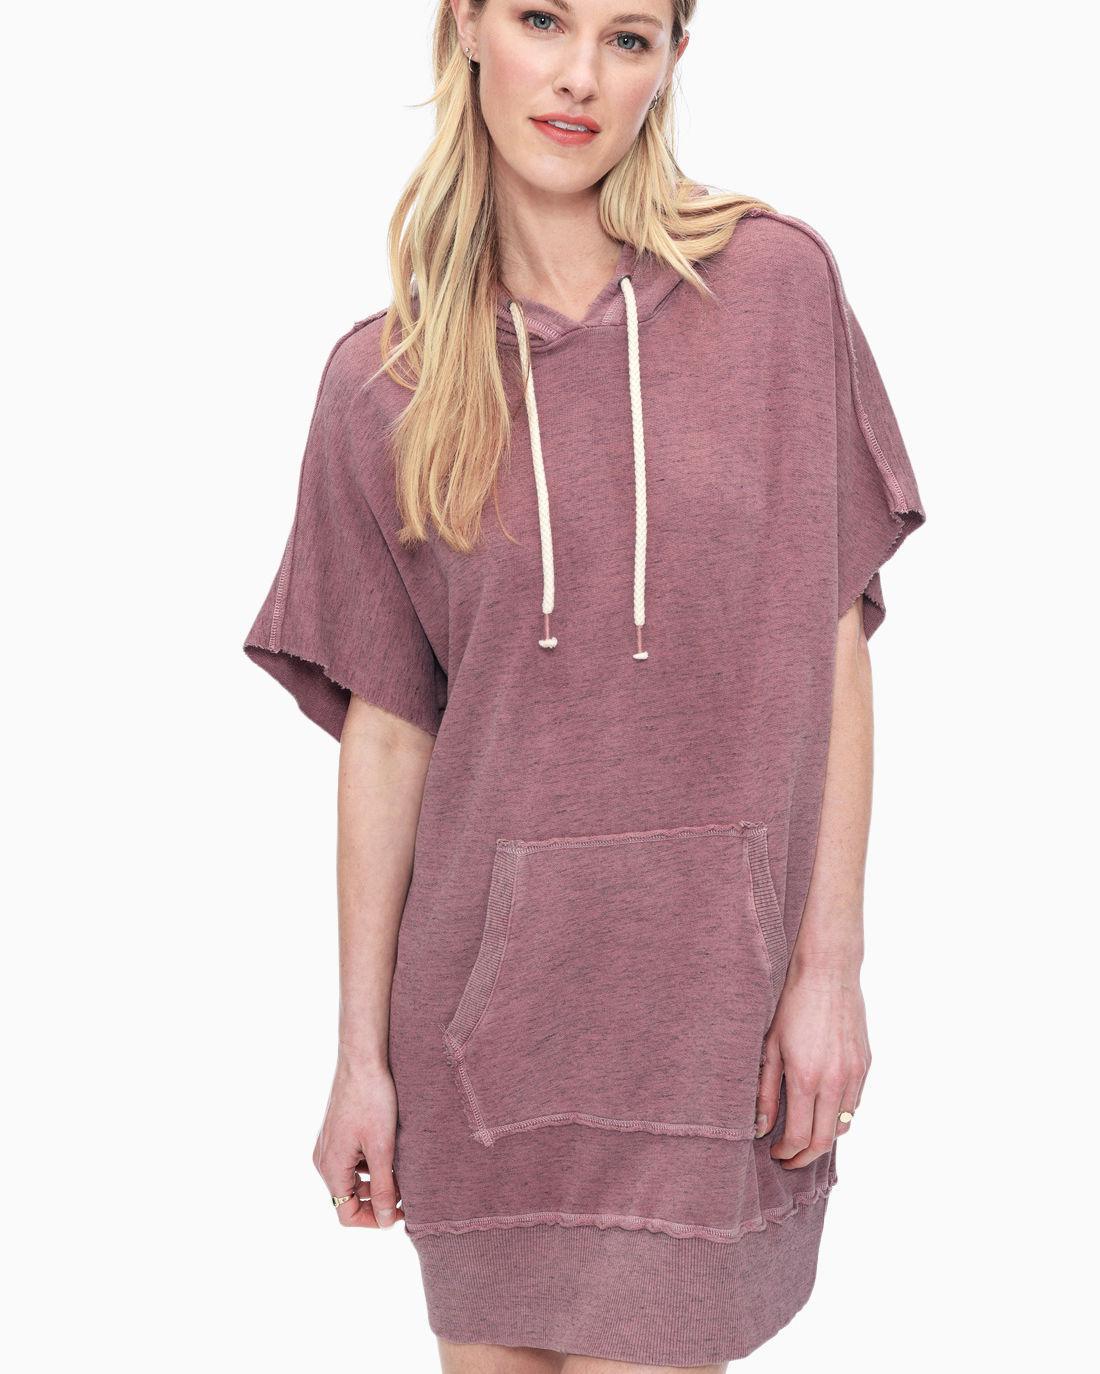 Lyst - Splendid Cubist Active Hoodie Dress f5fee0ede0